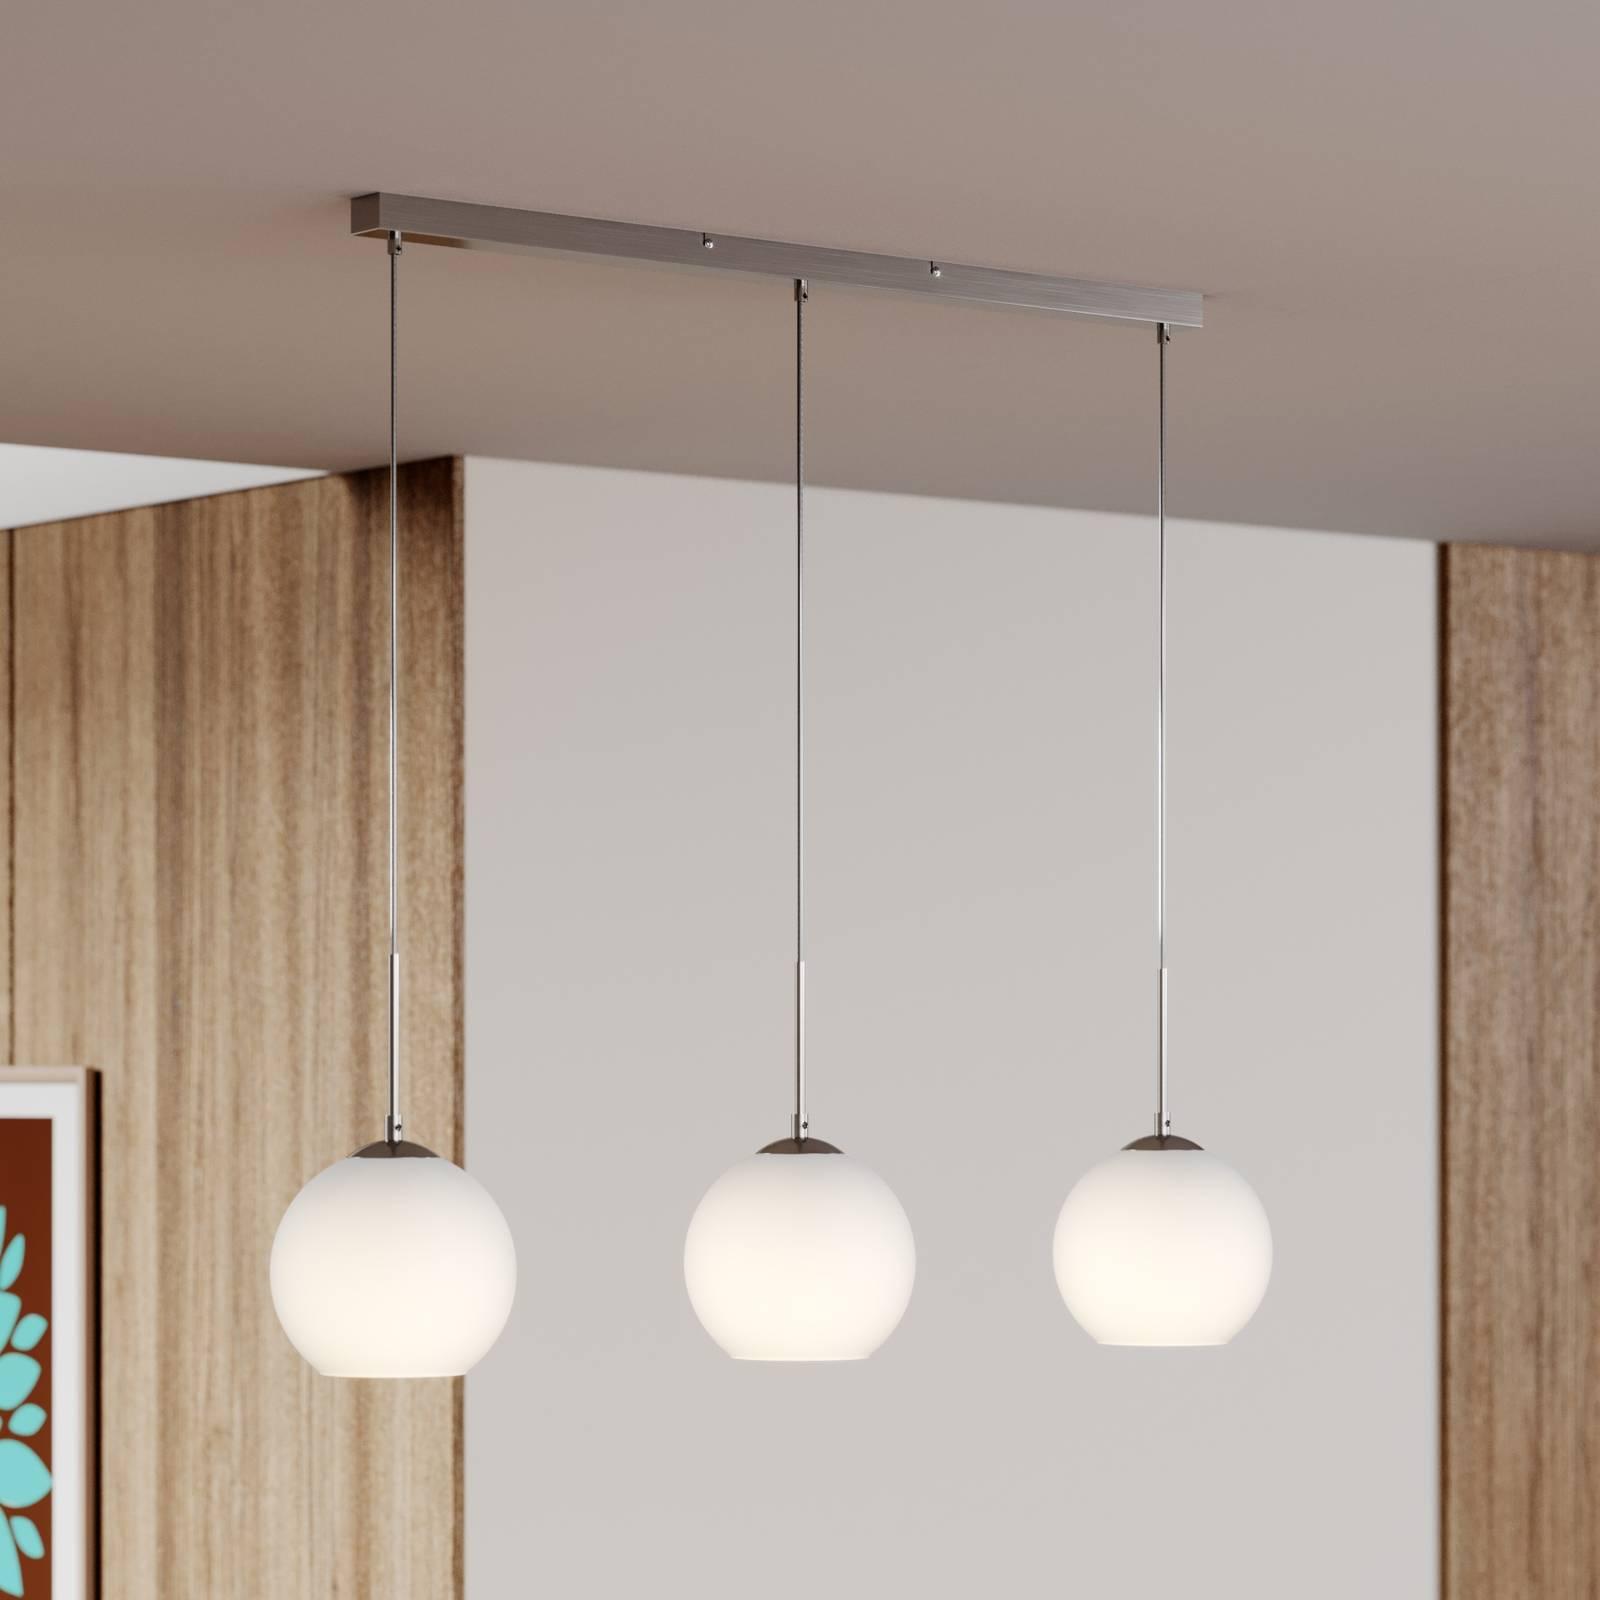 Lindby Smart LED-riippuvalo Morrigan, sovellusk.